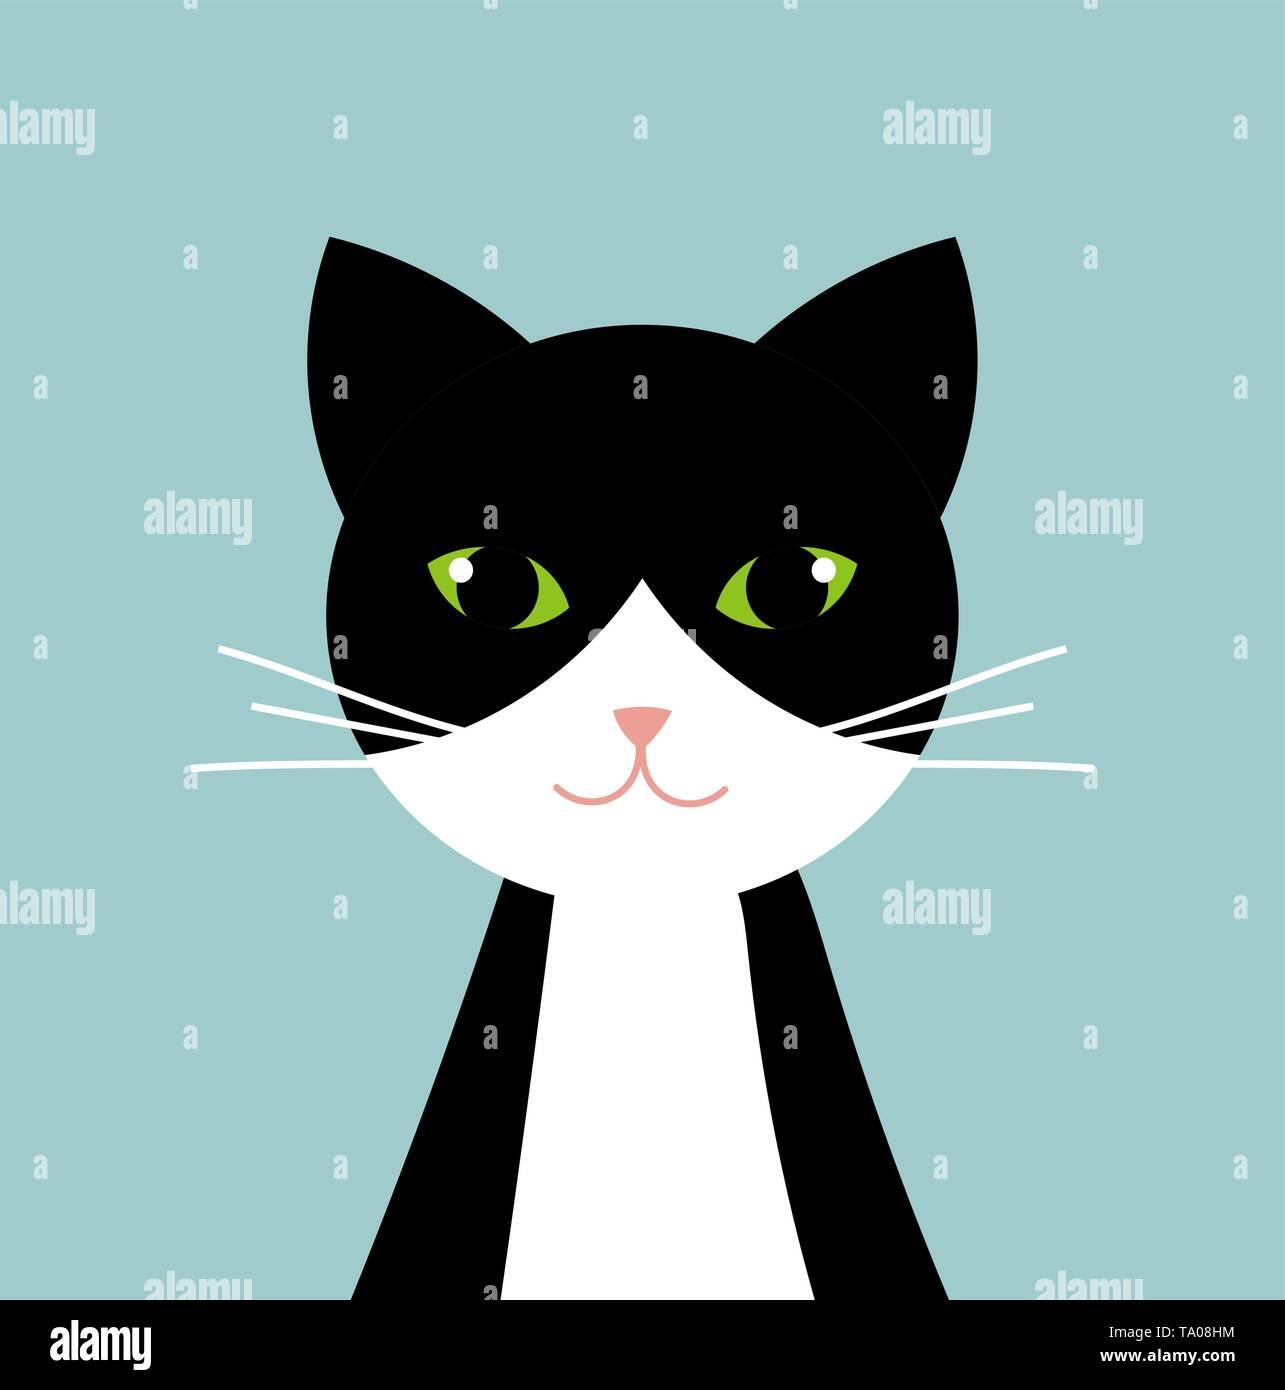 Black and white cat portrait. Vector illustration - Stock Image